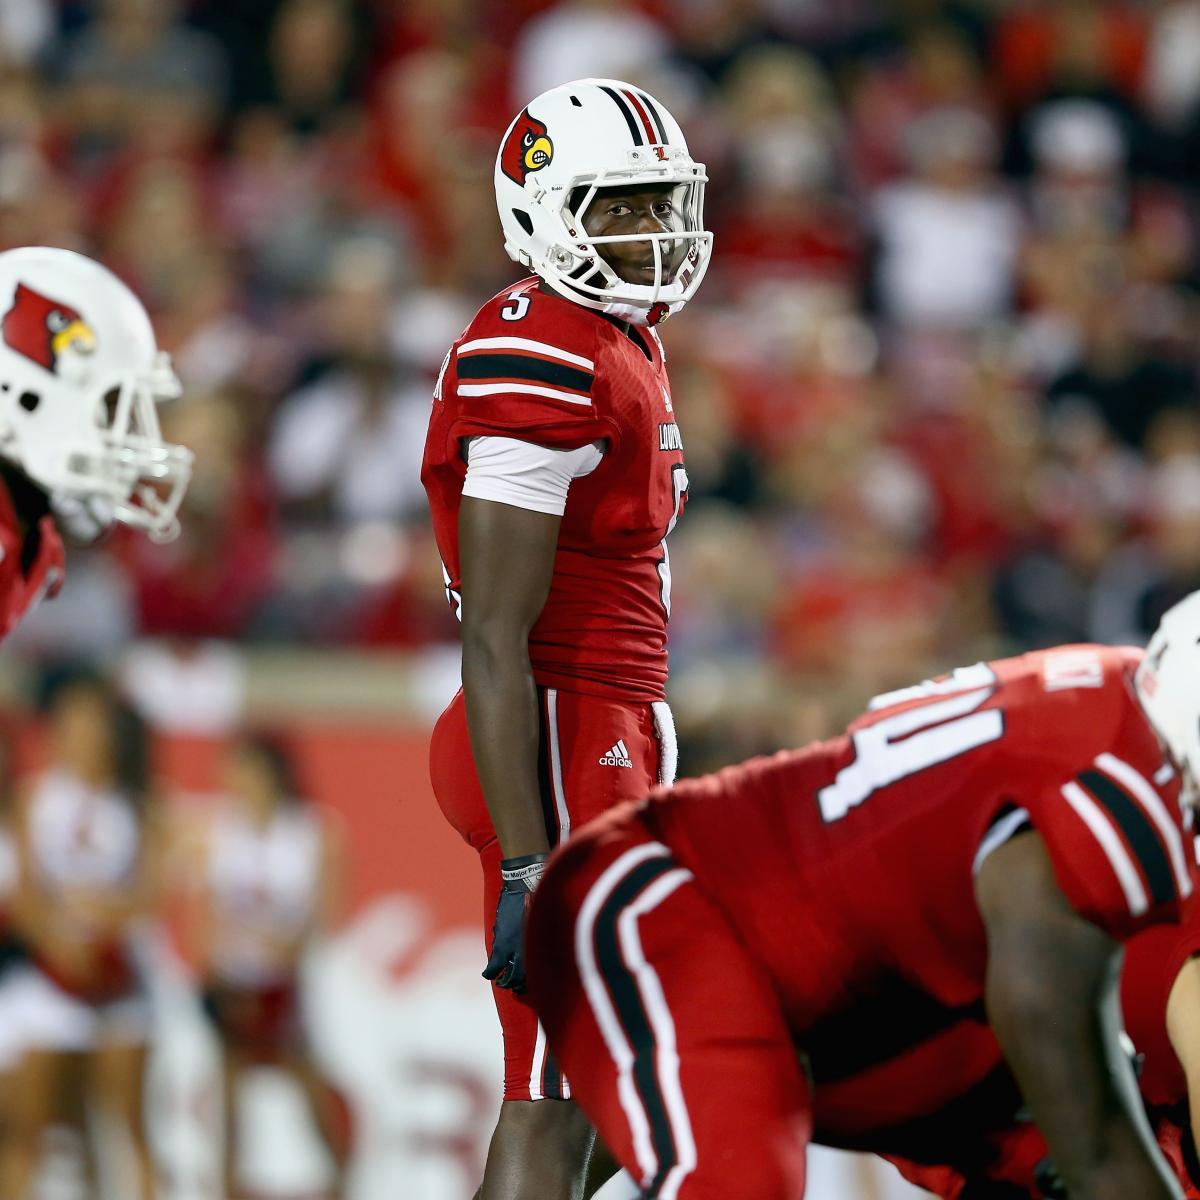 Louisville Football: Will the Cardinals Reach the BCS ...